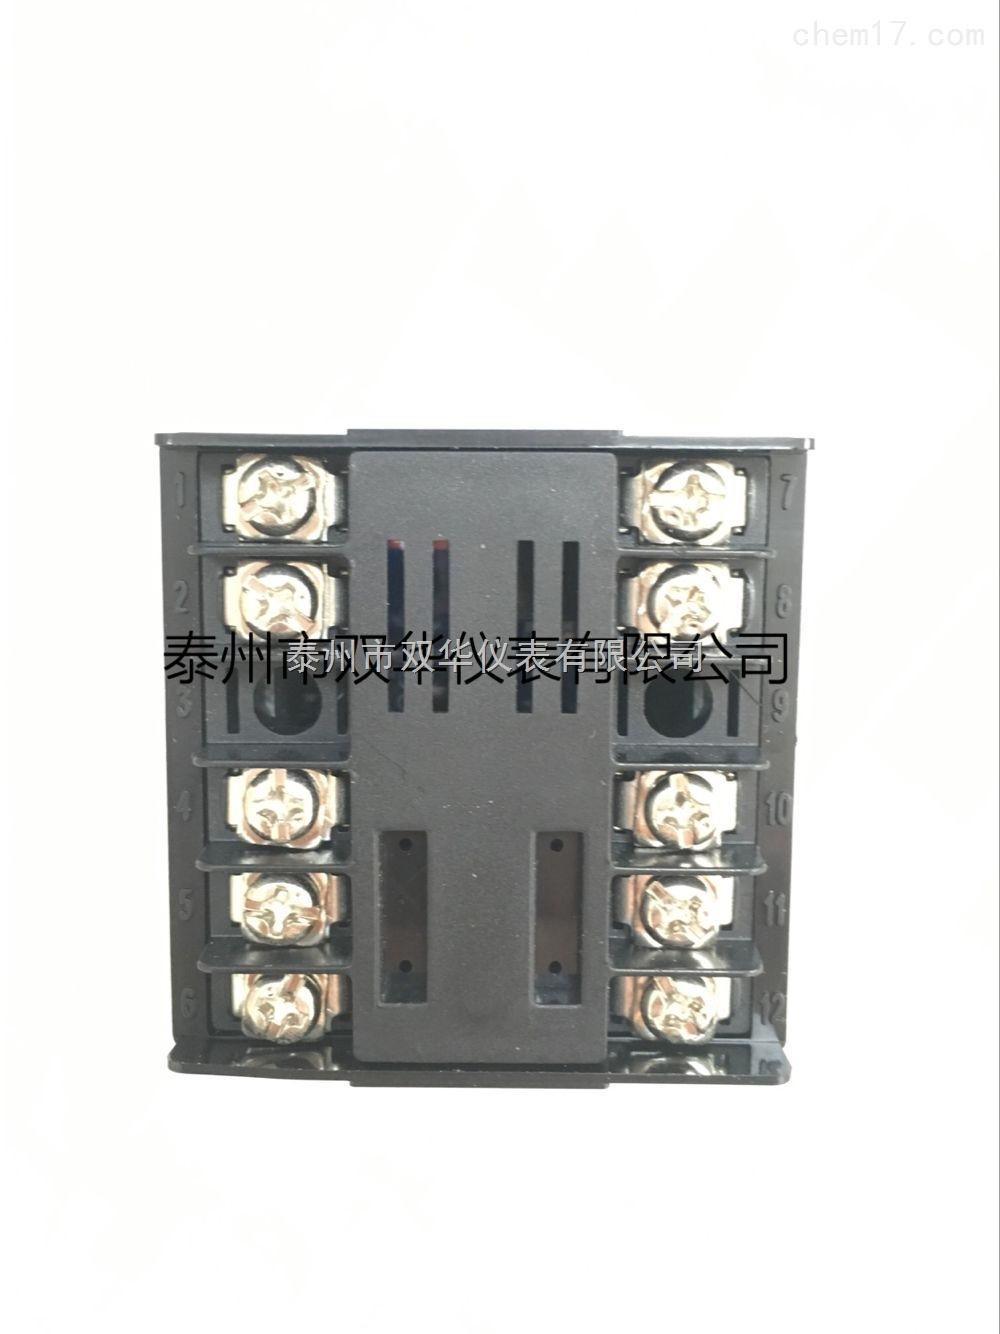 XMTG-7412智能温控仪为双排四位数码管显示,分别显示测量值和设定值;仪表外观紧凑,节省空间;四键操作,参数设置简易,使用操作方便。输入信号多种可选;控制方式有位式控制、PID控制;采用超强抗干扰芯片设计,质量可靠、性价比极高。 仪表选型 XMT -7